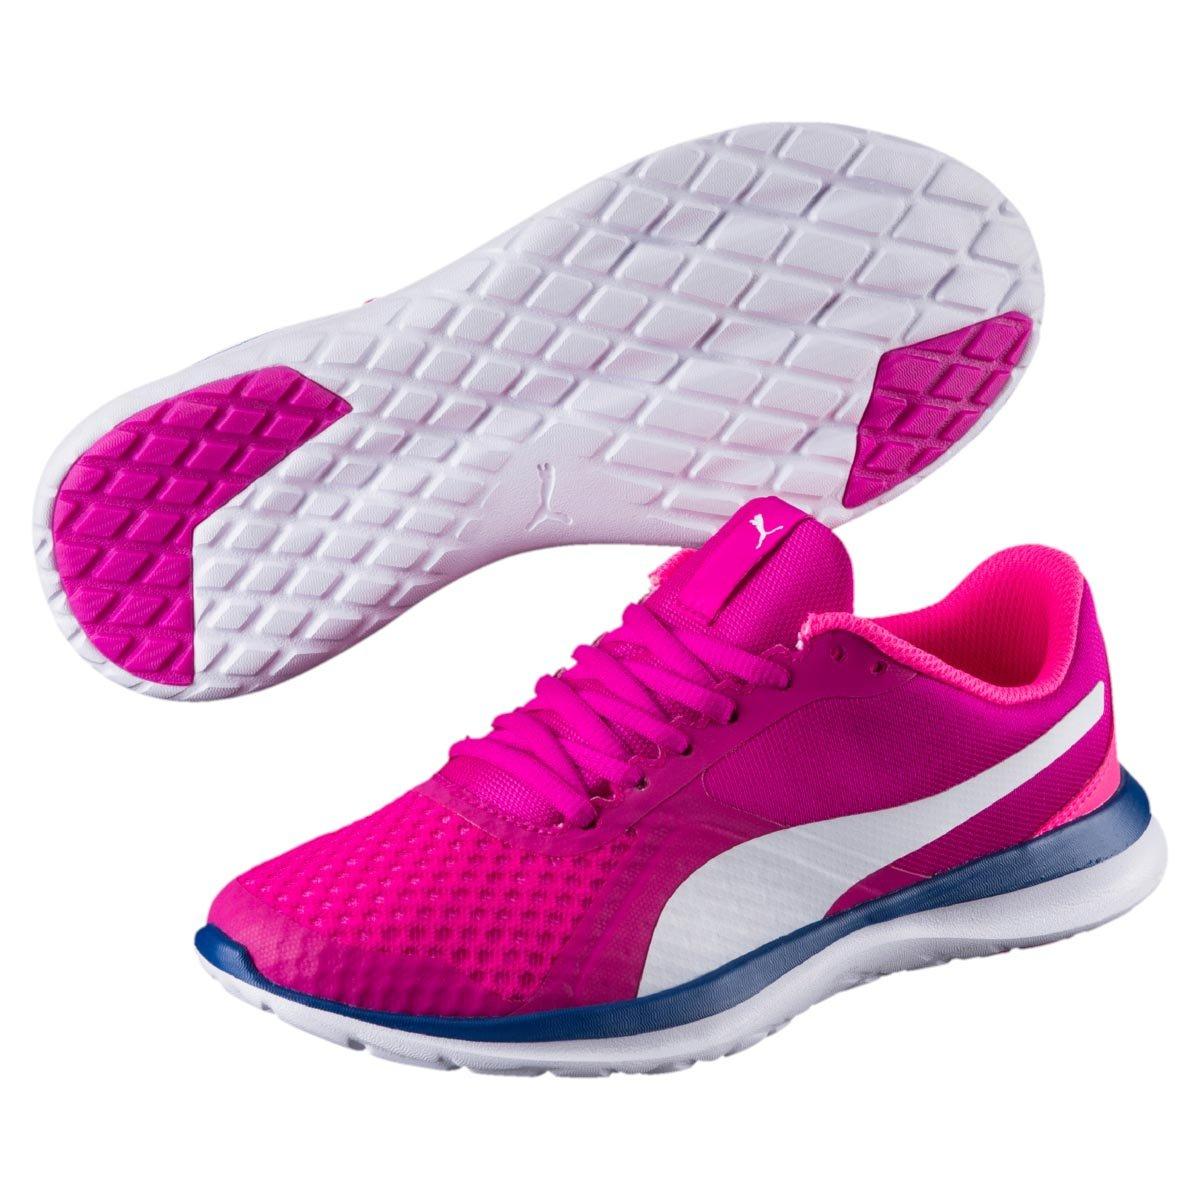 2tenis puma mujer running rosa